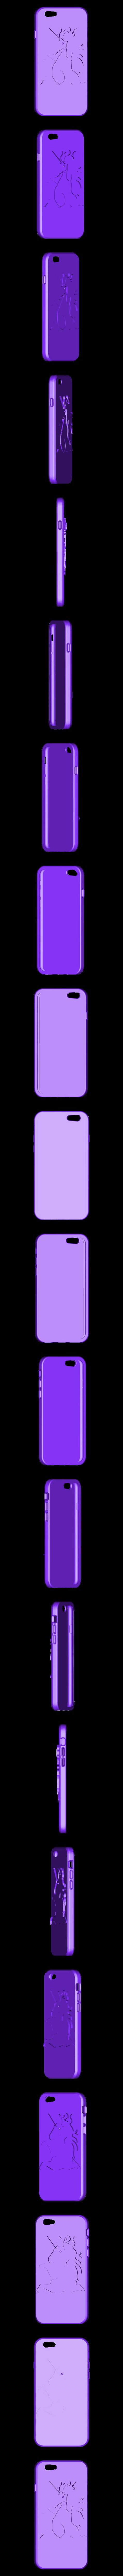 Licorne.stl Download OBJ file Iphone 6 unicorn shell • 3D printable model, Ukiyograph